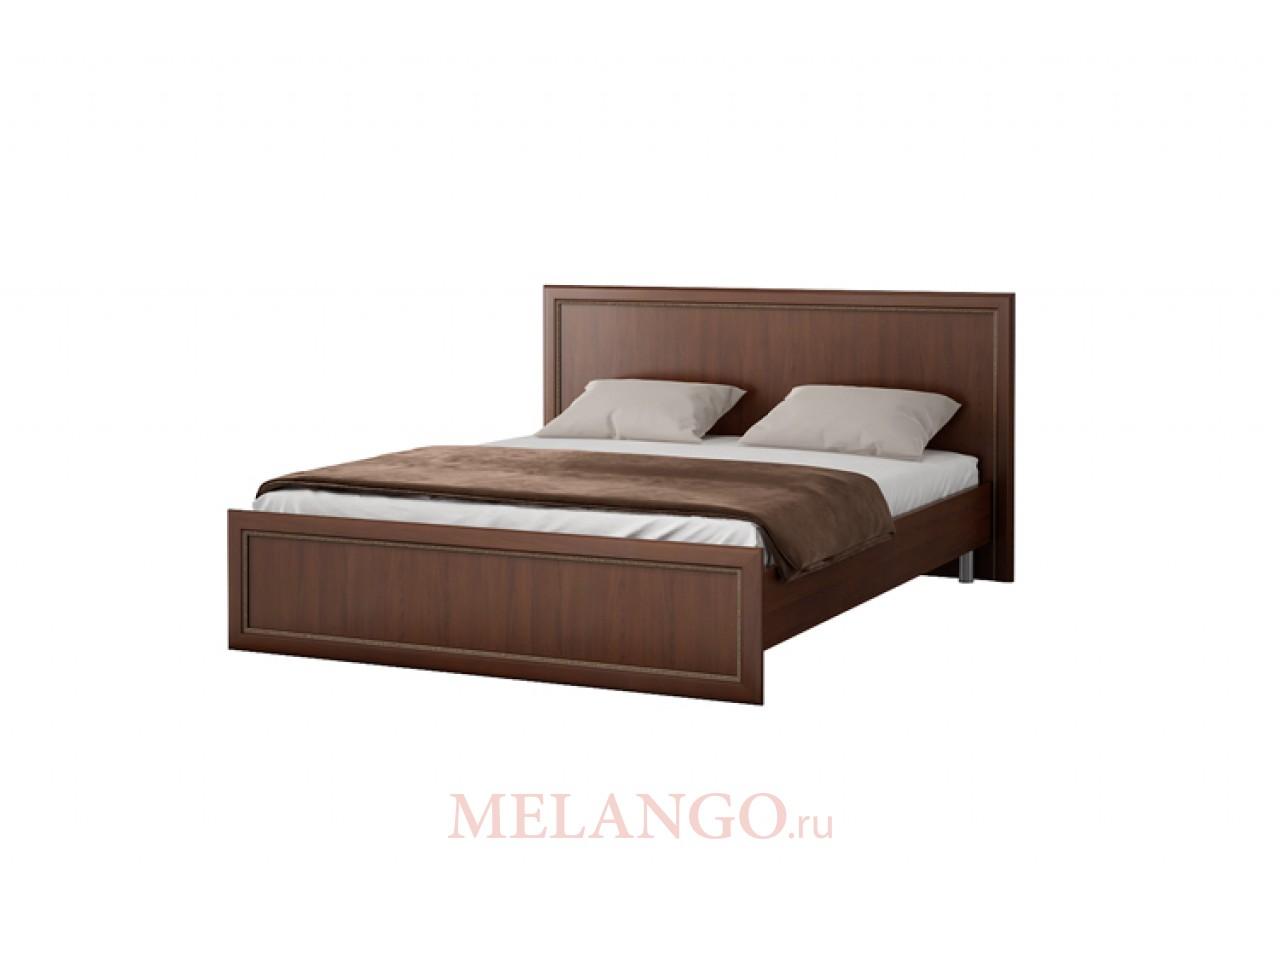 Двуспальная кровать Луара ЛУ-800.26 (160х200)